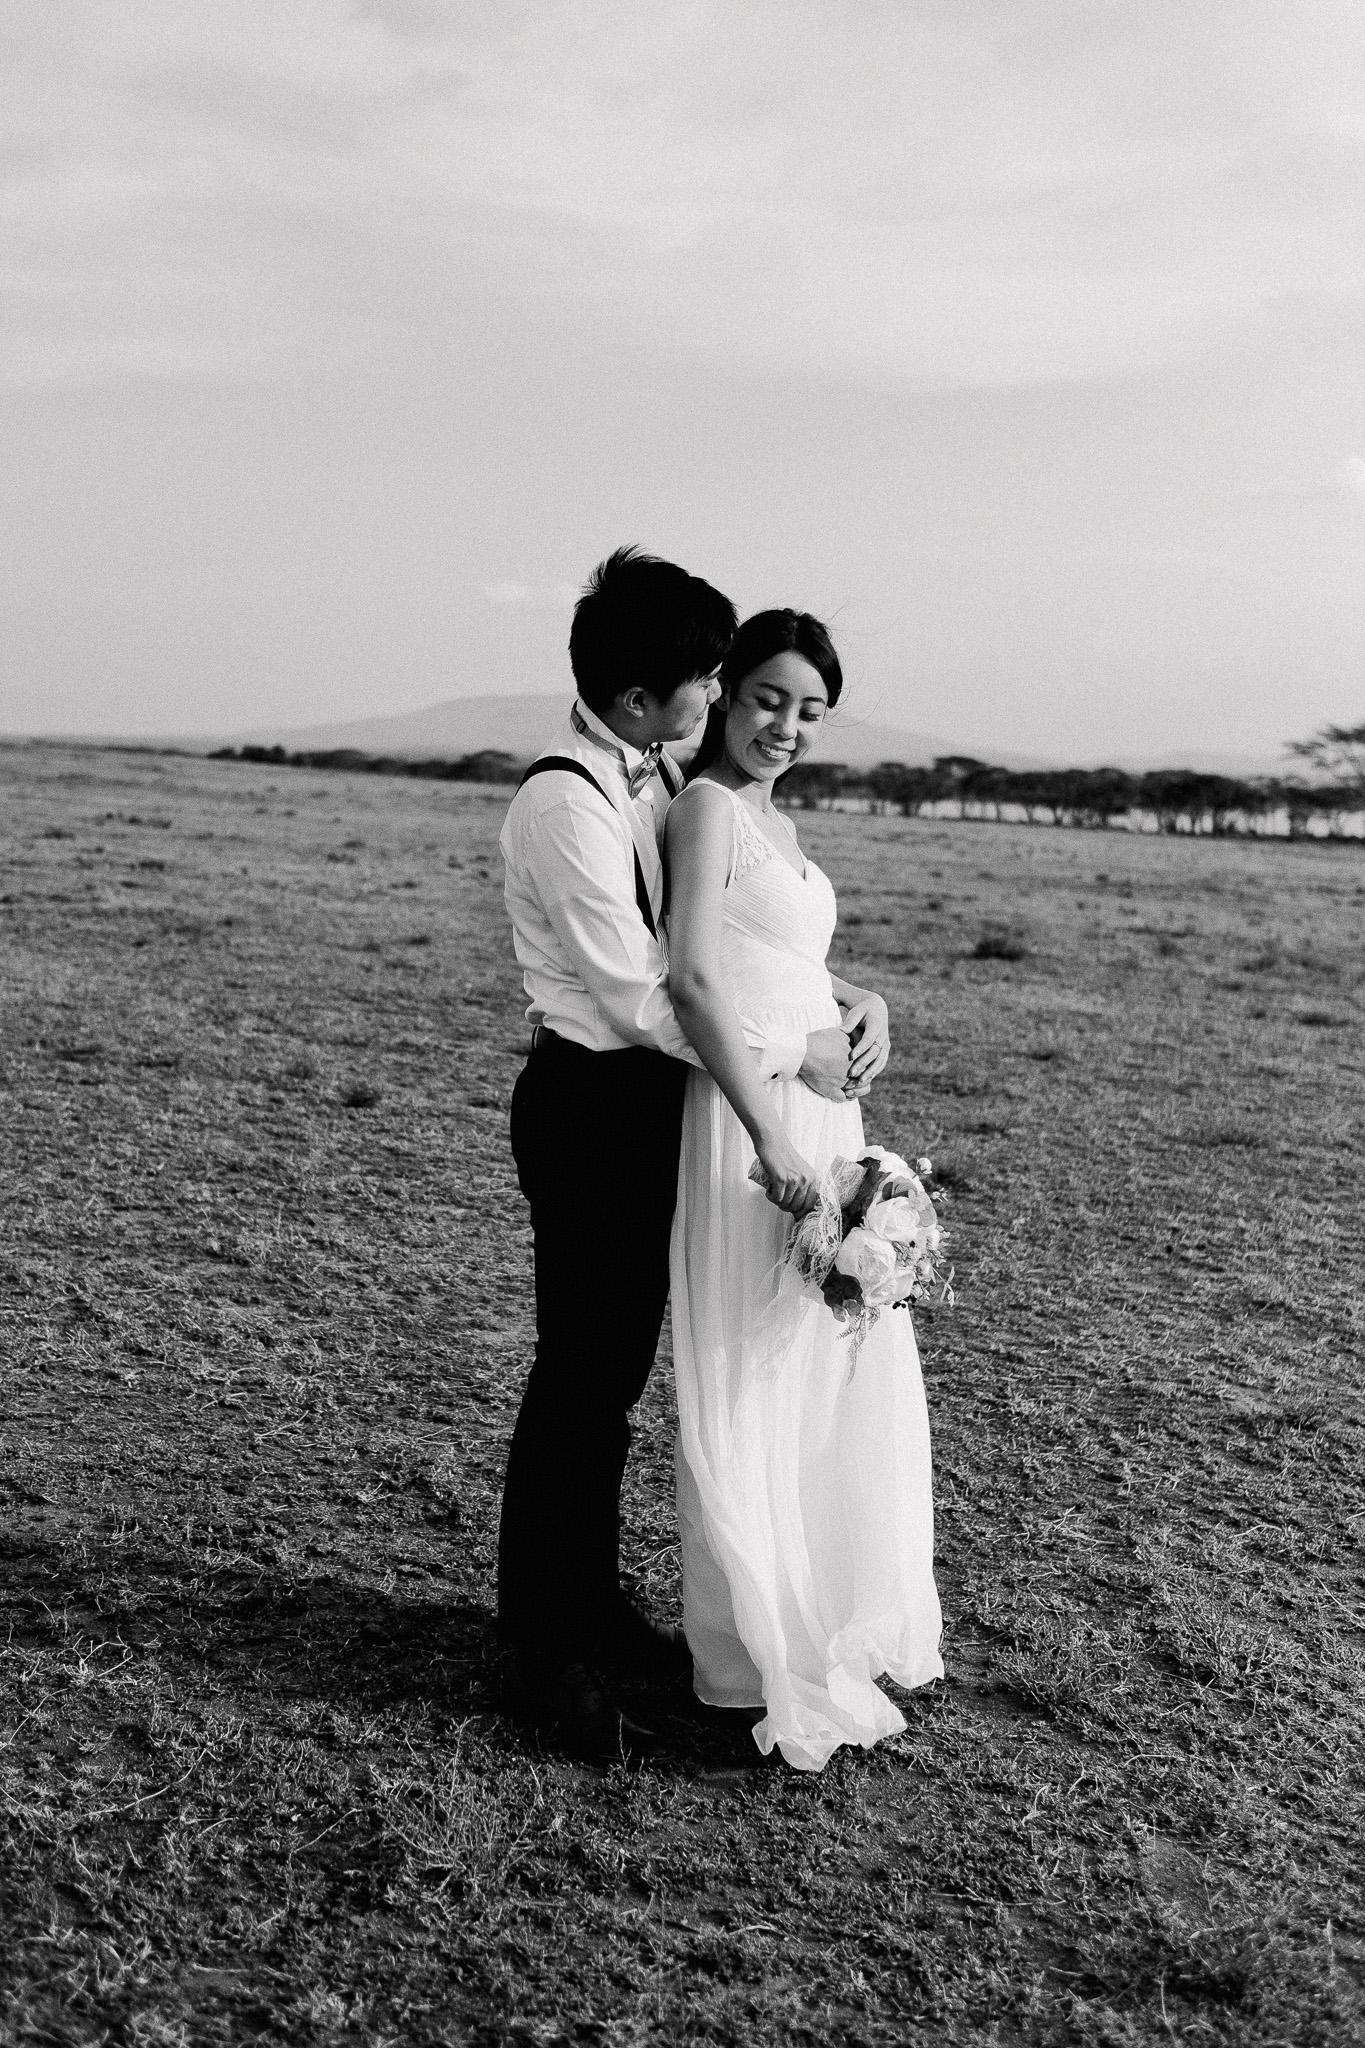 Anna-Hari-Photography-Safari-Elopement-Kenya-Wedding-Photographer-Kenya-70.jpg